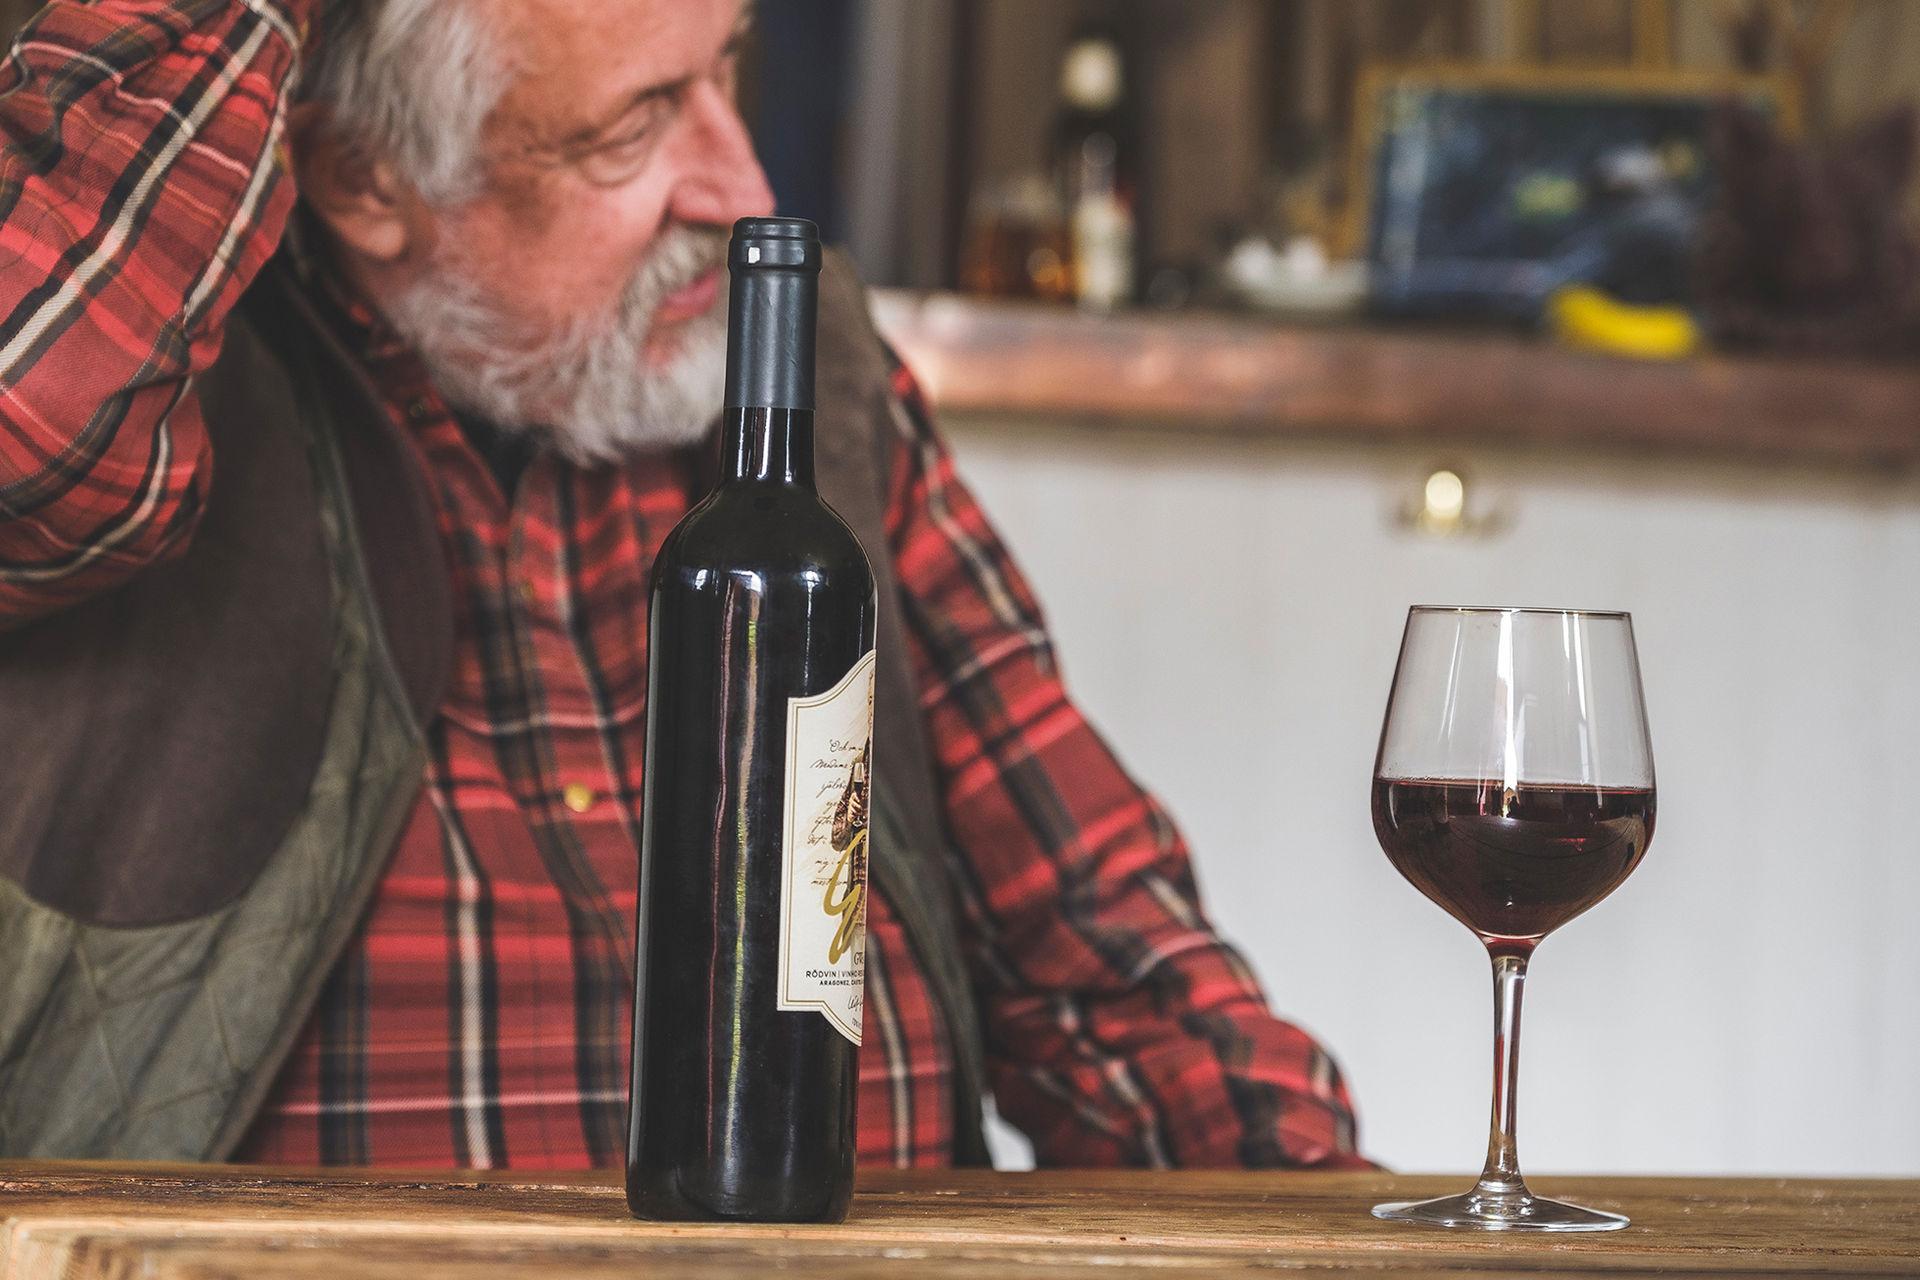 Leif GW Persson lanserar vin